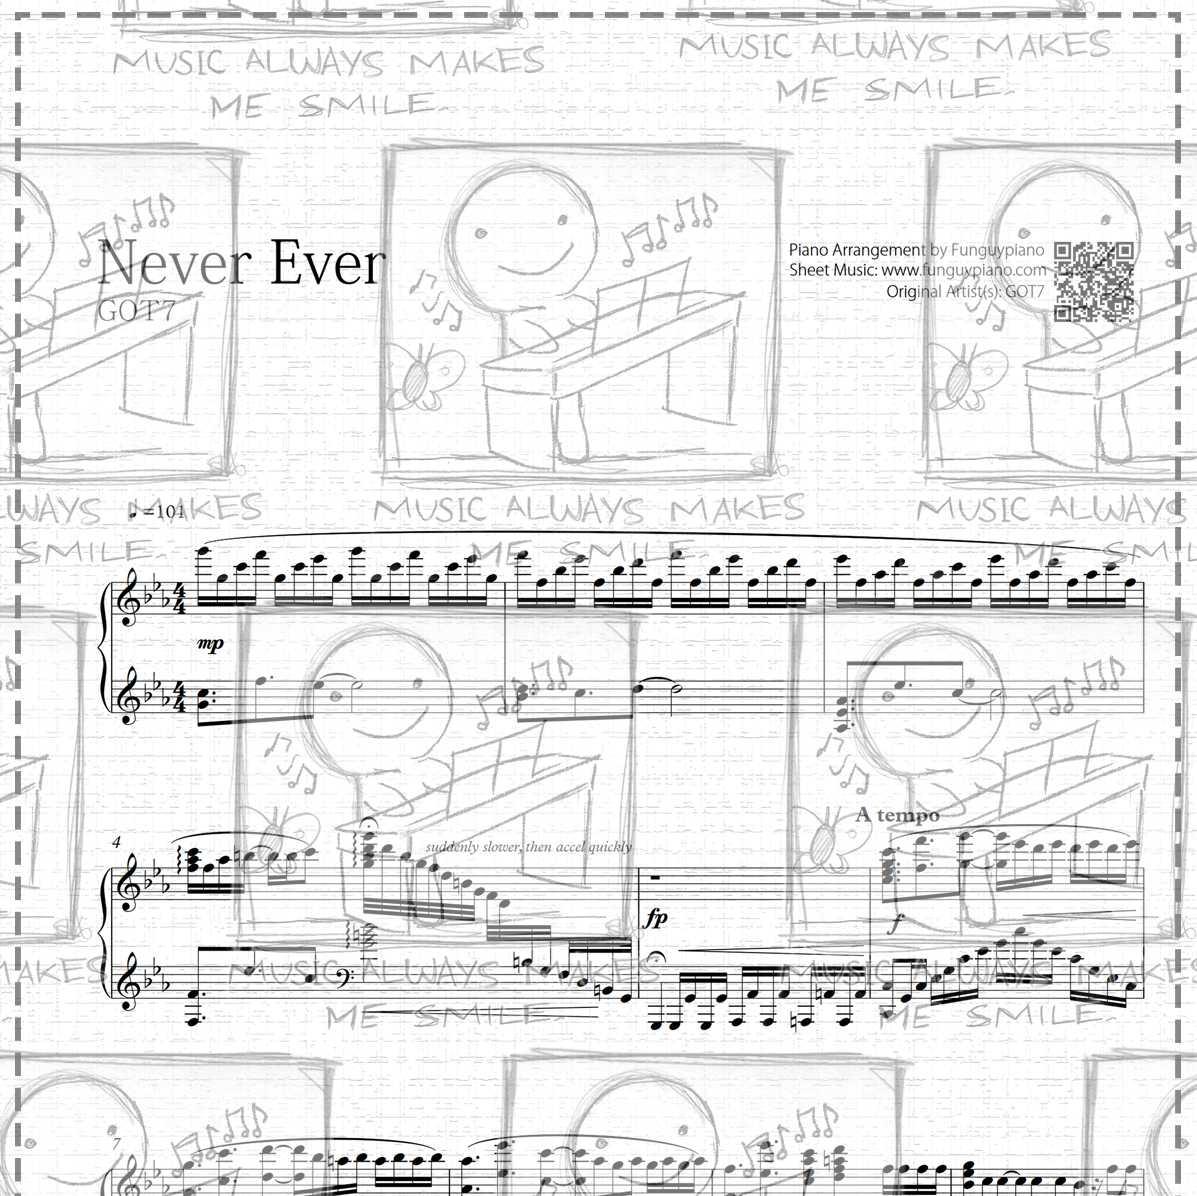 Piano Sheet Music Midi: GOT7 - Never Ever [ Sheet Music / Midi / Mp3 ]